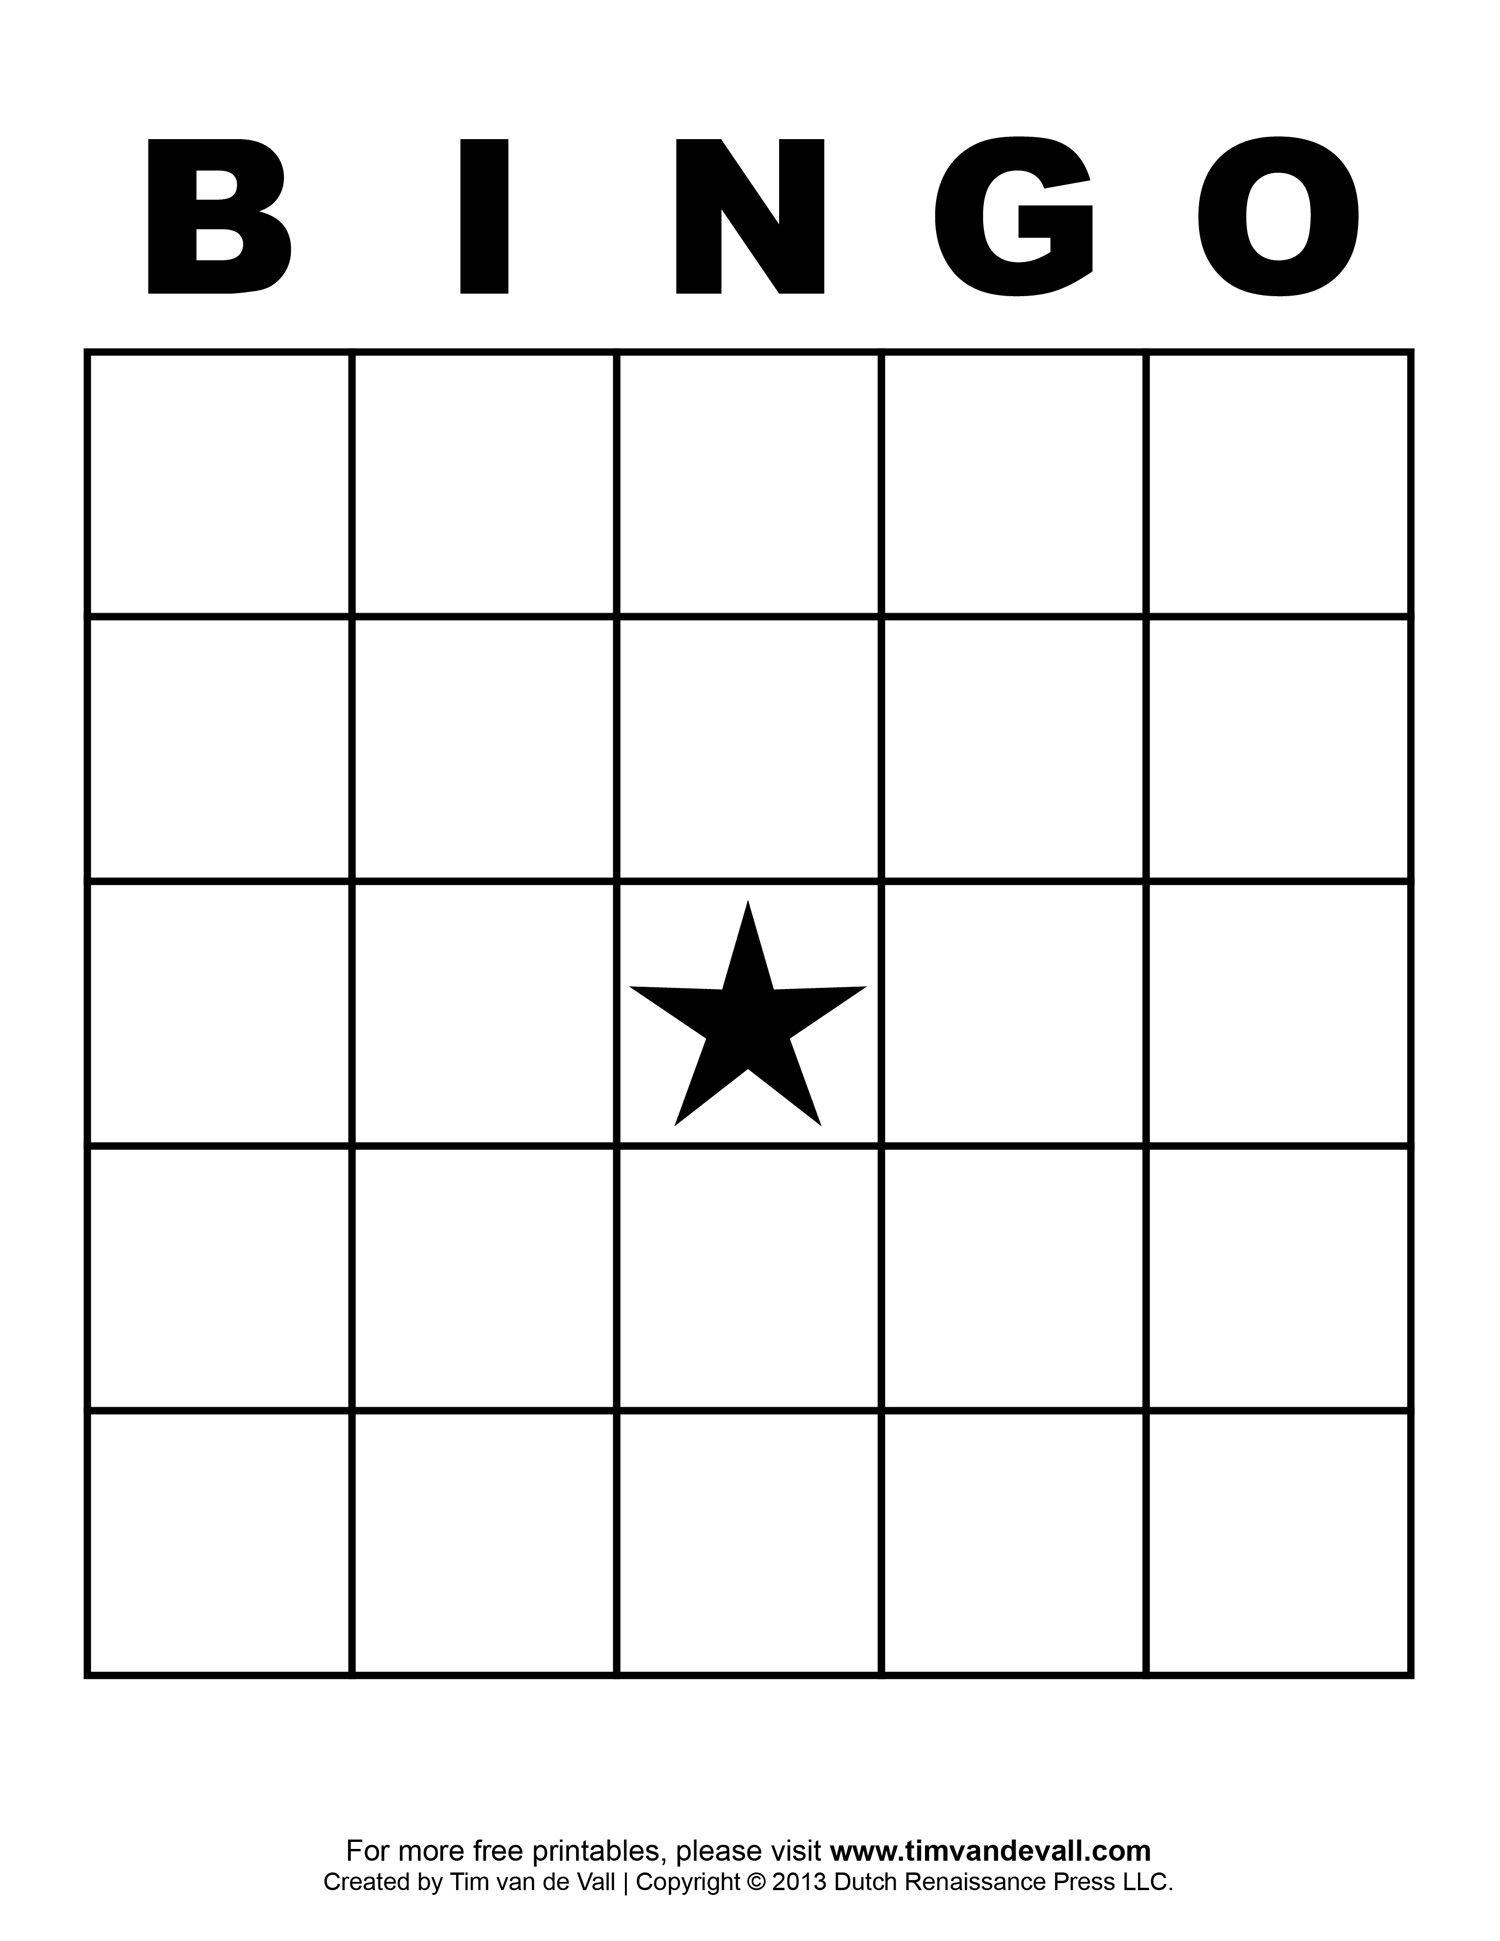 Free Printable Blank Bingo Cards Template 4 X 4 | Classroom | Sight - Free Printable Bingo Cards For Large Groups